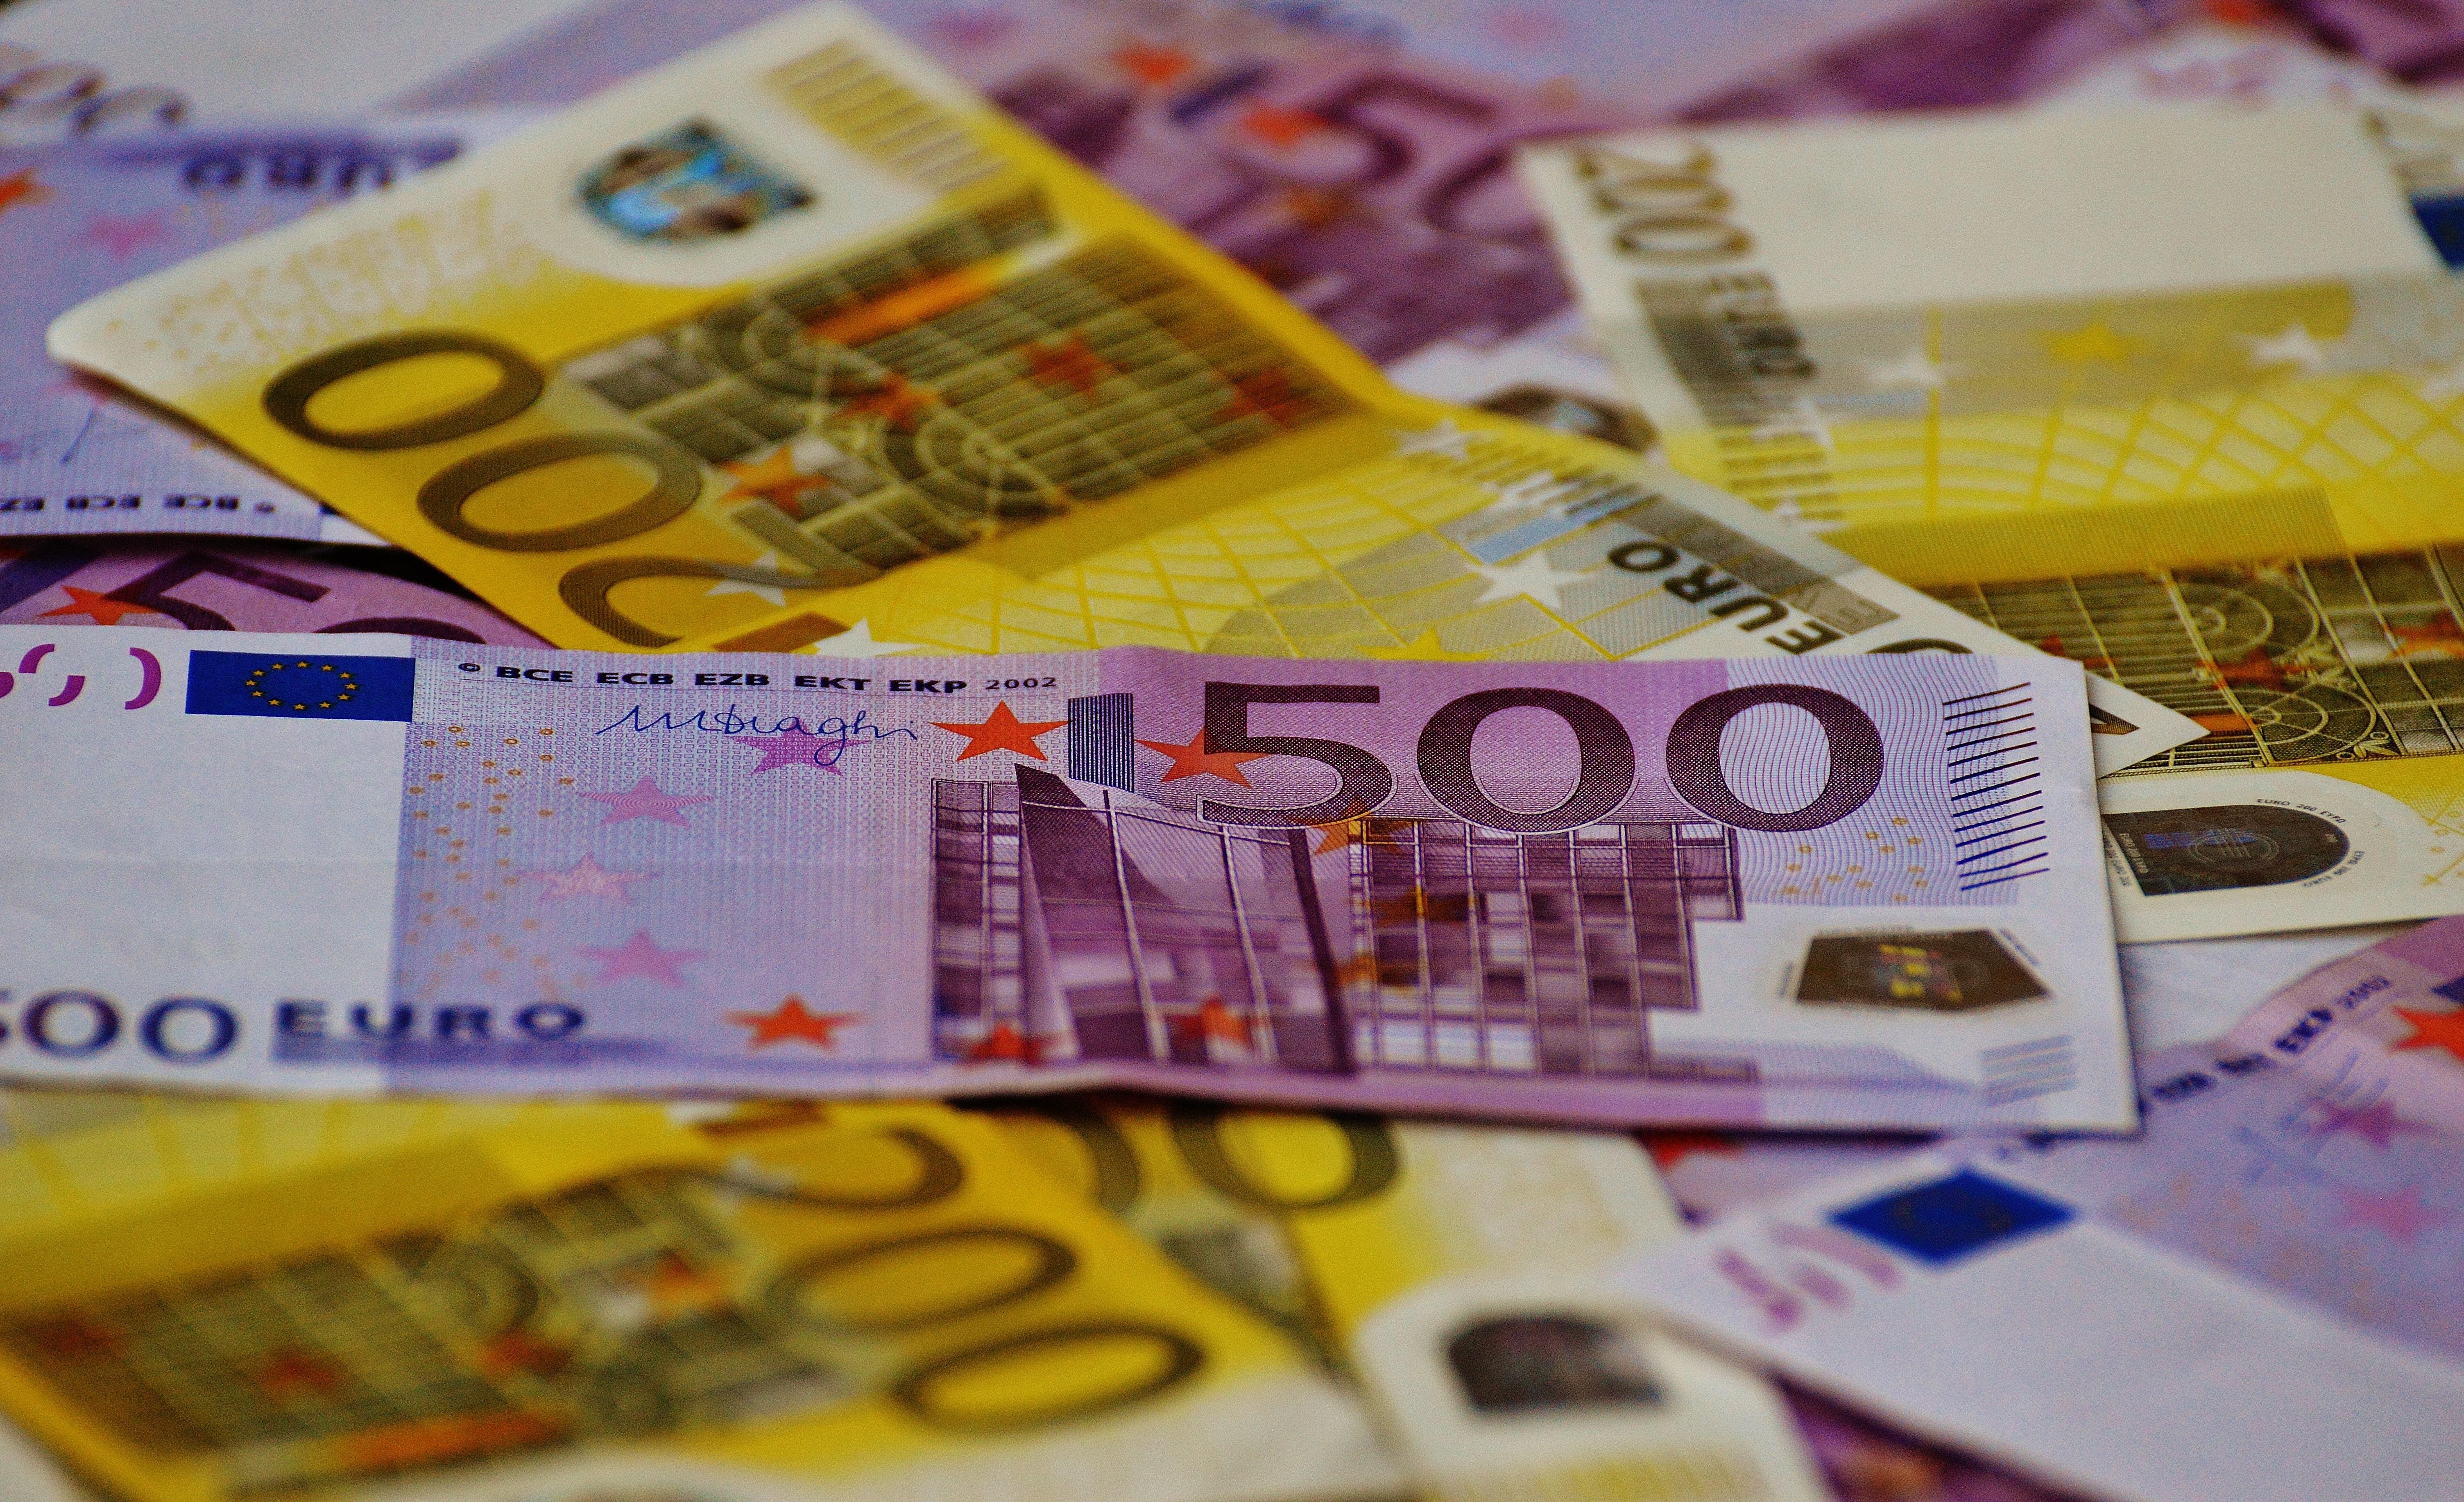 Euro, Bank notes, Bills, Blur, Cash, HQ Photo